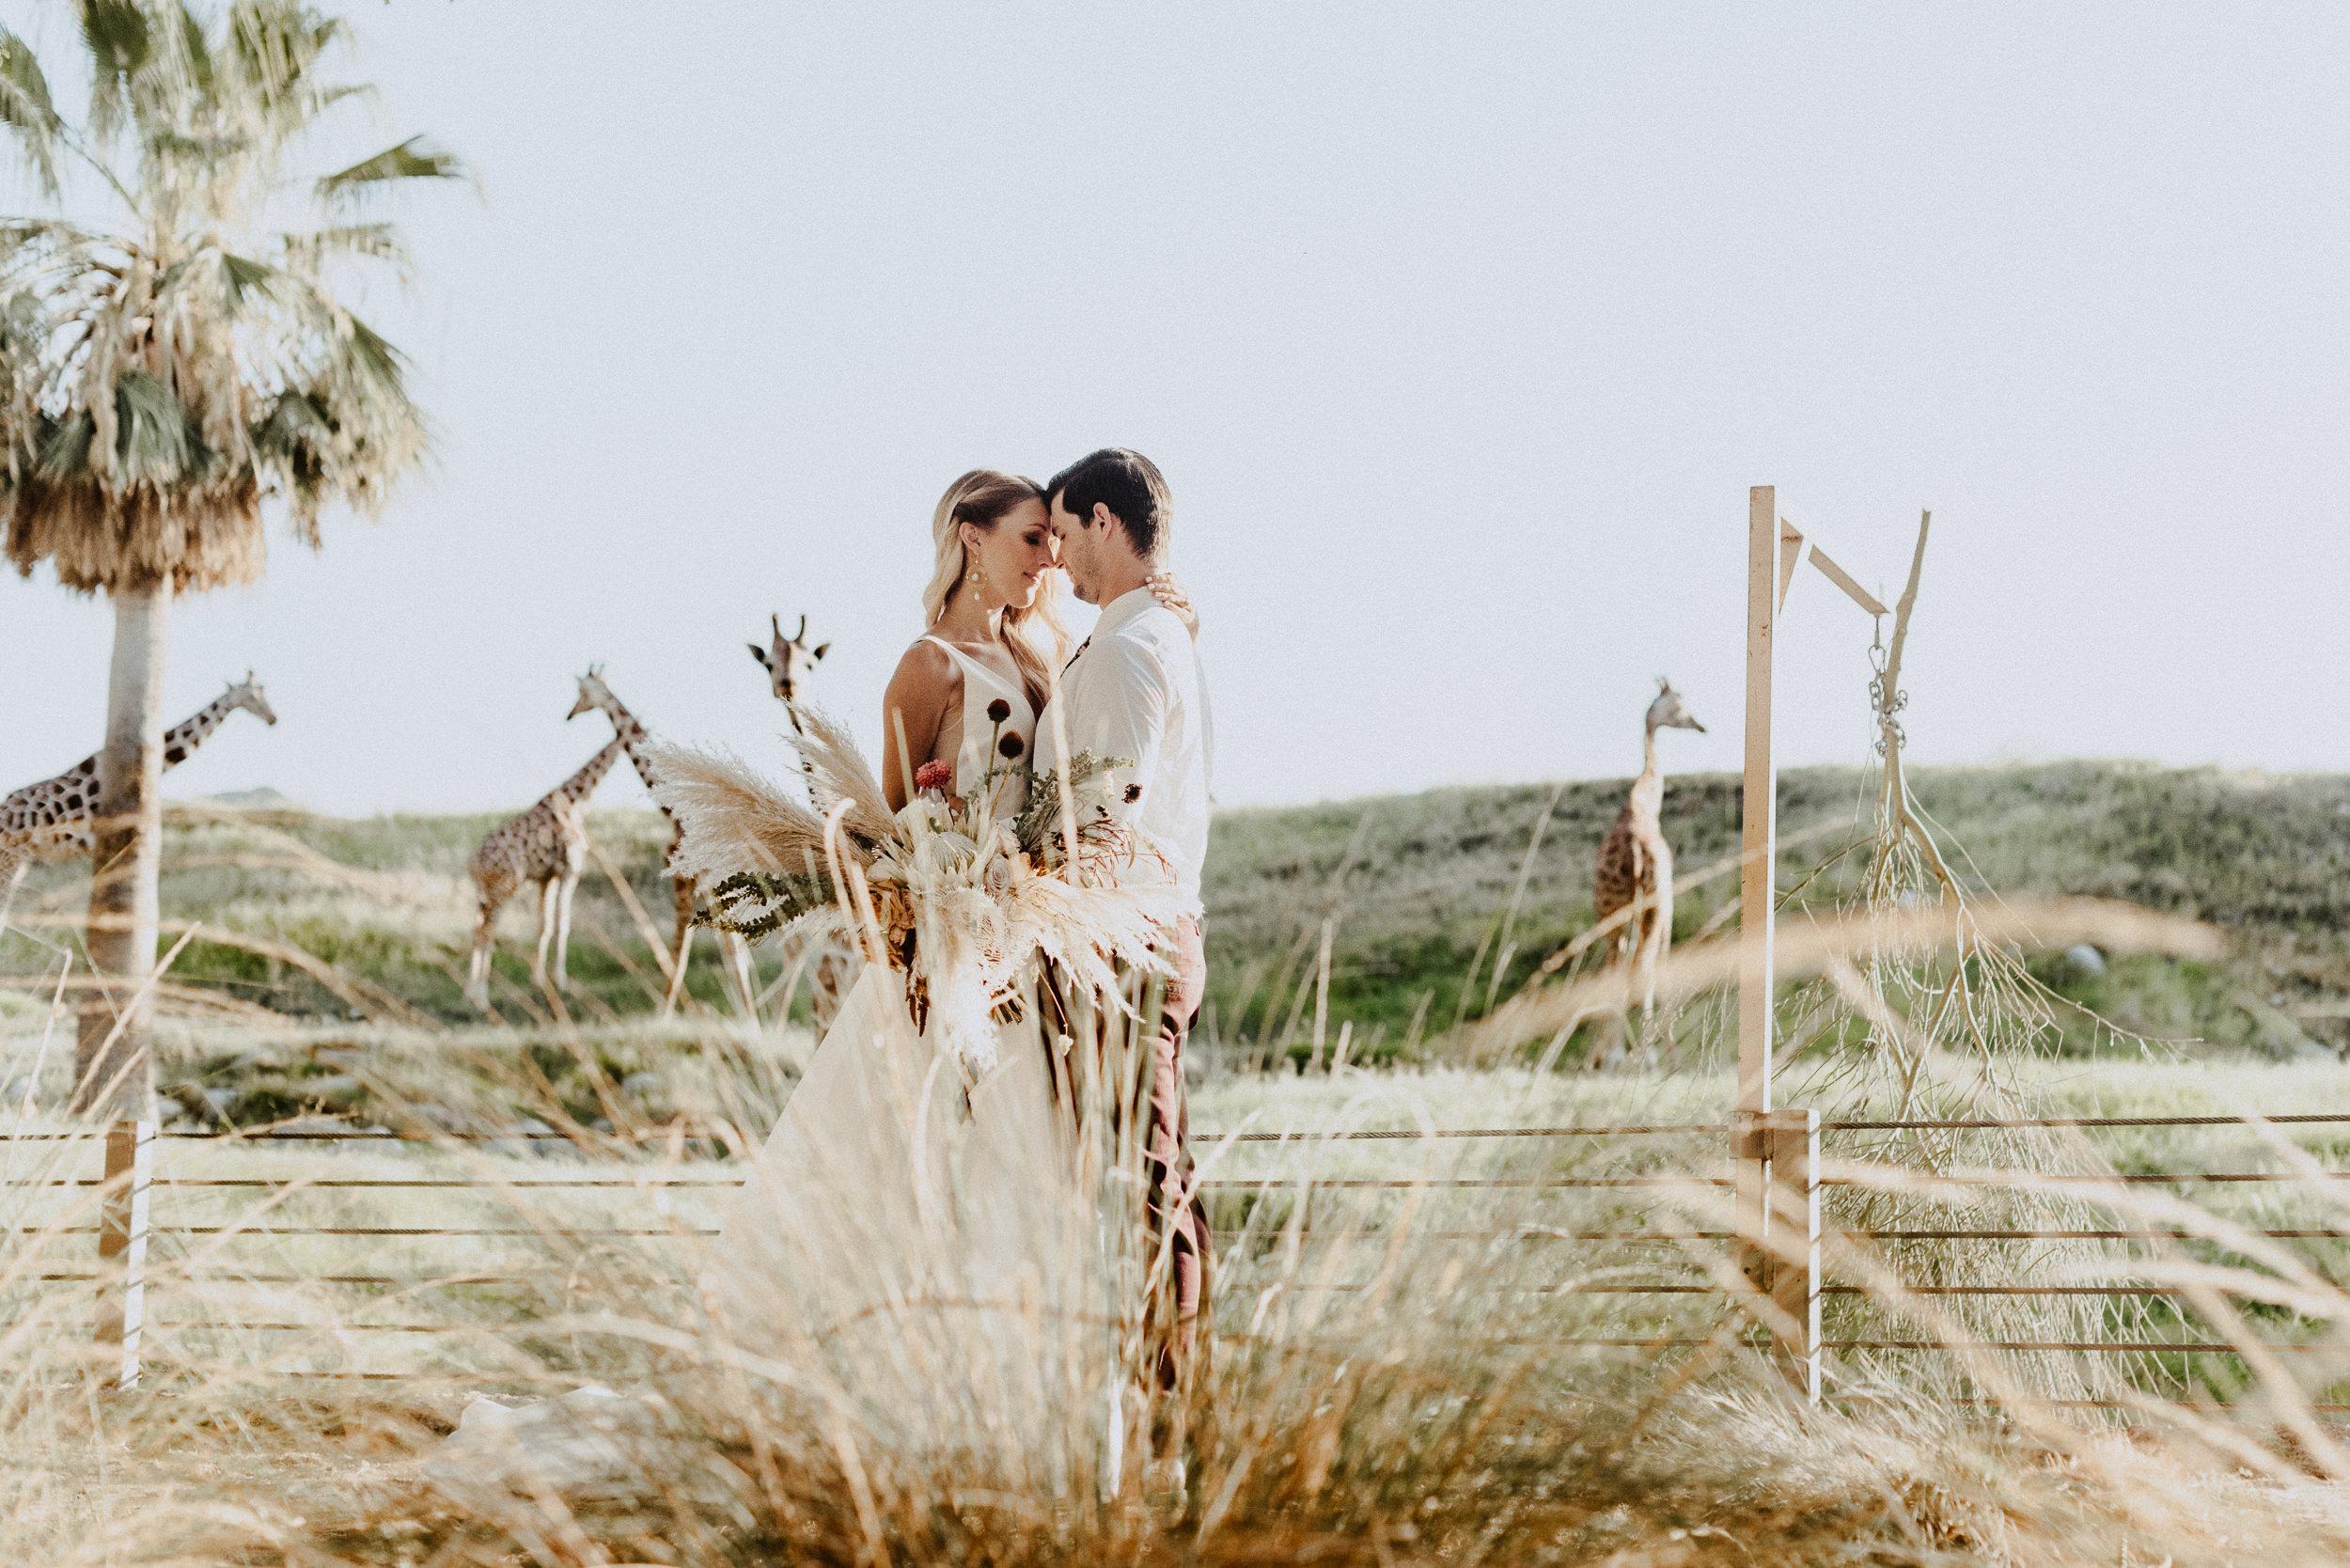 sChelsie + Chris - The Desert Shootout Wedding Romantics at The Living Desert-82.jpg